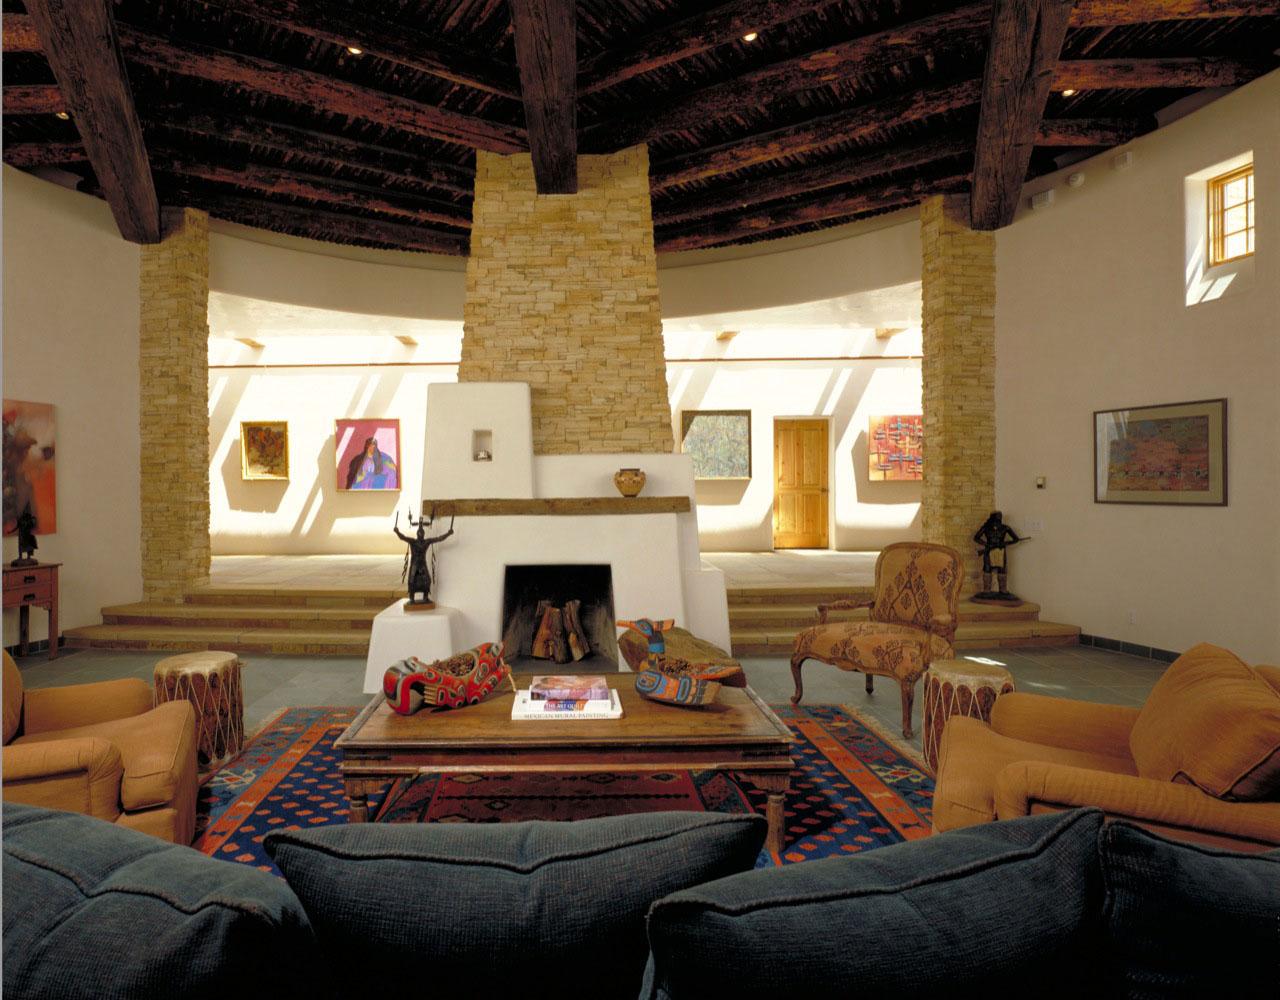 Southwestern-Interior-Design-Style-and-Decoration-Ideas-7 Southwestern Interior Design, Style and Decoration-Ideas